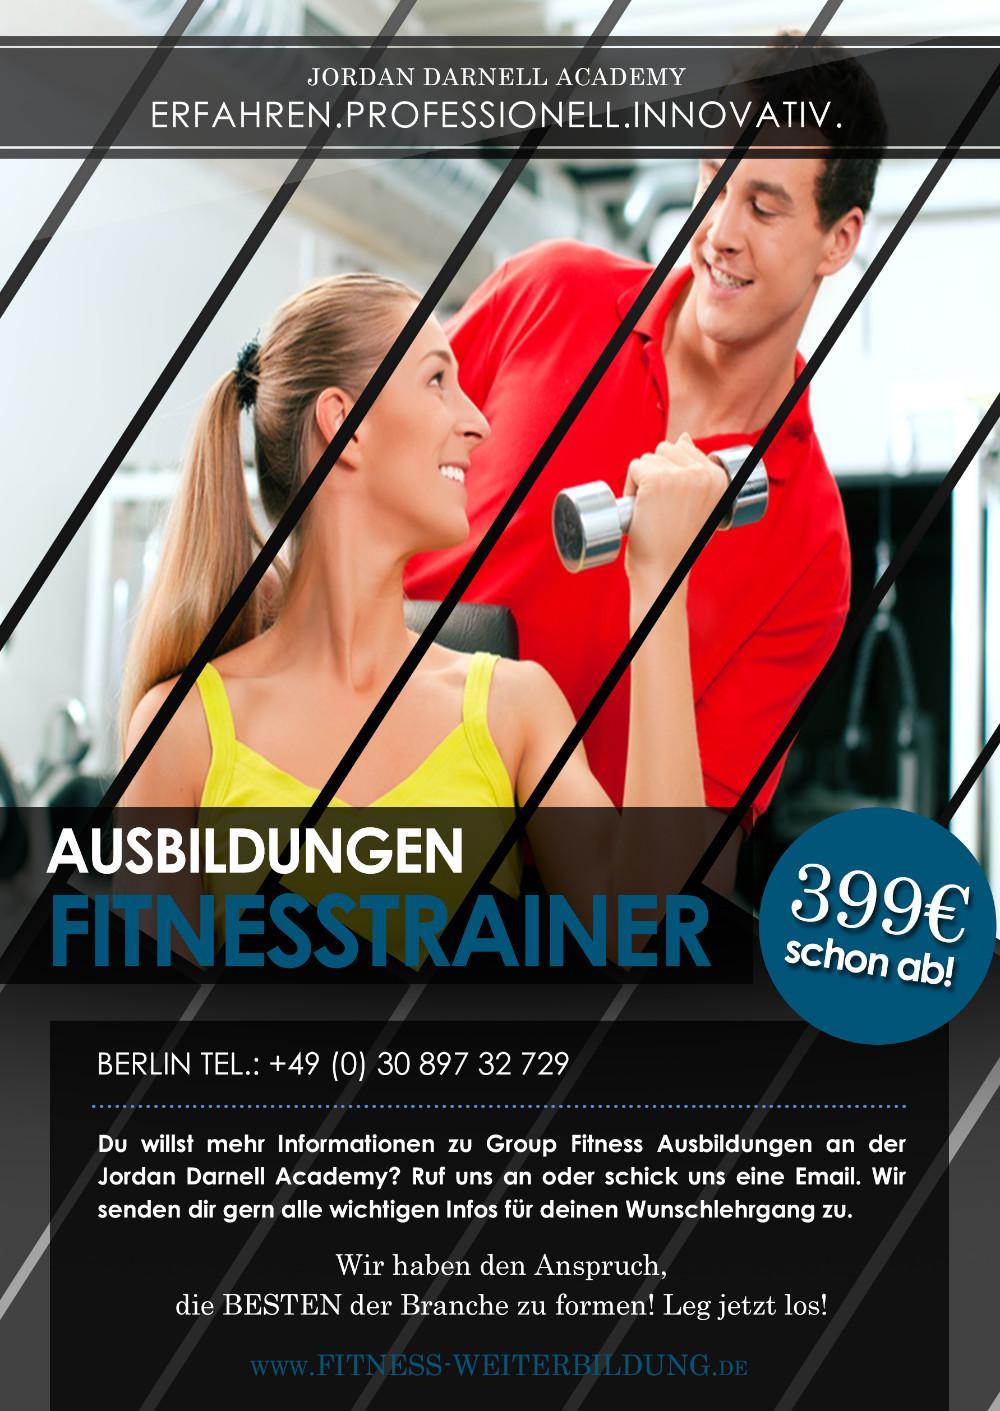 fitnesstrainer b lizenz an der jordan darnell academy 845849. Black Bedroom Furniture Sets. Home Design Ideas